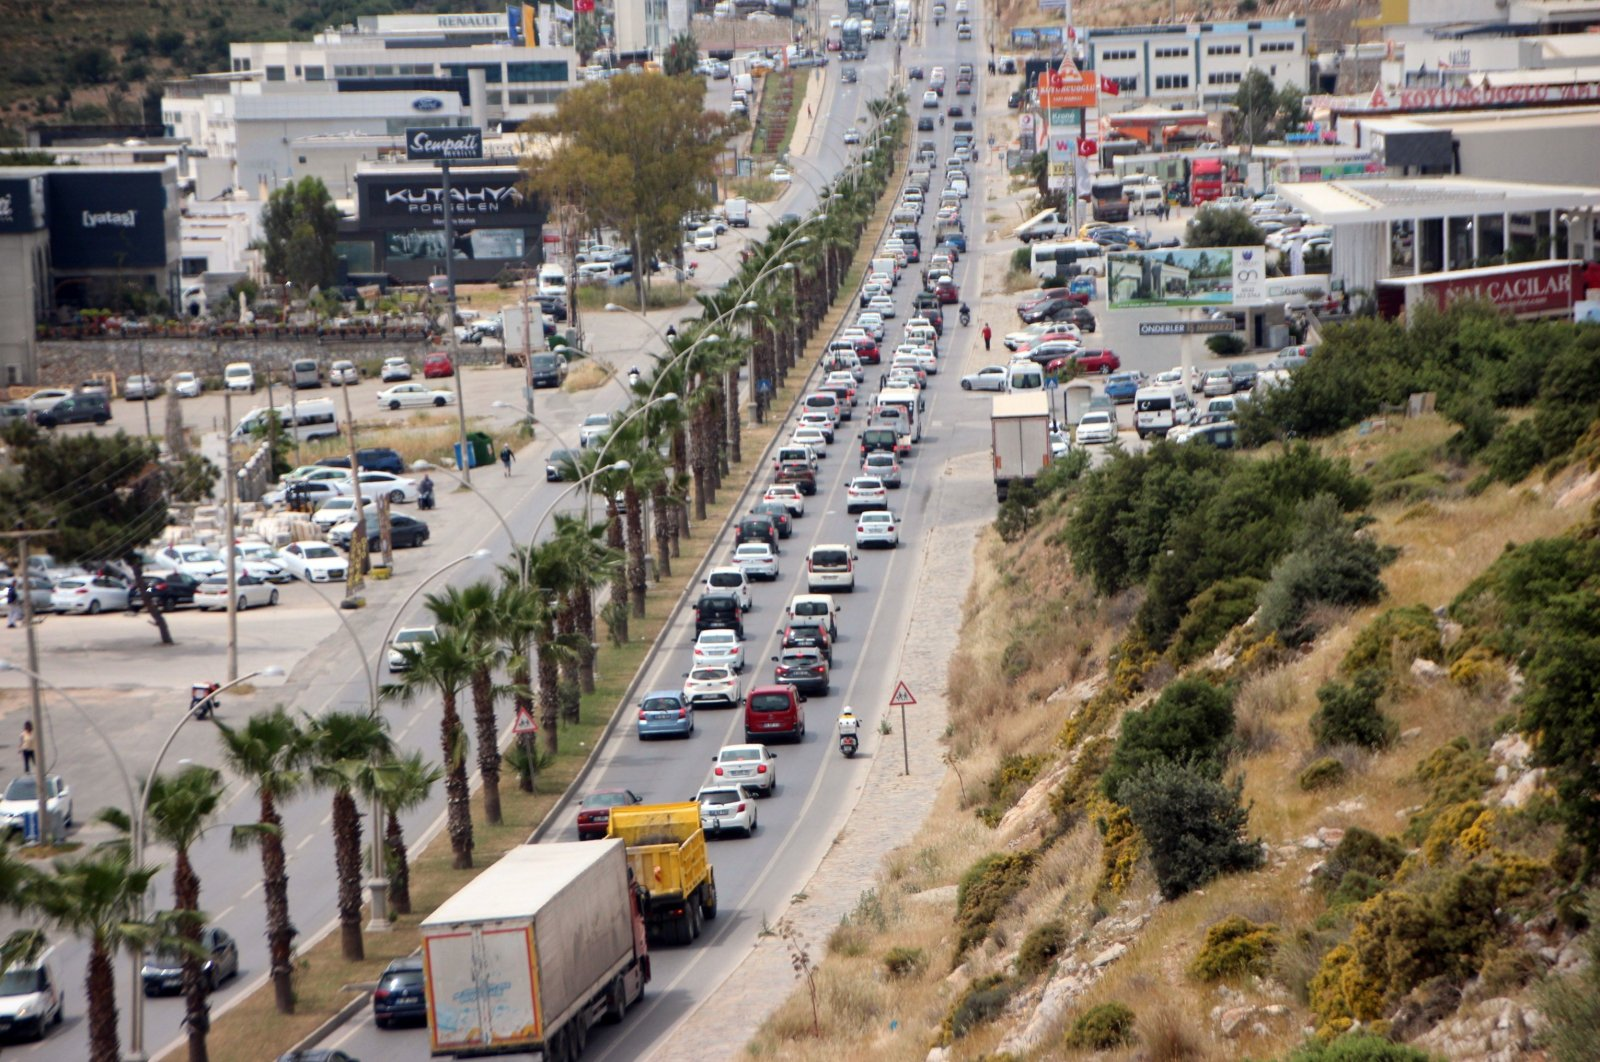 A long line of vehicles heading to Bodrum, in Muğla, southwestern Turkey, April 29, 2021. (İHA PHOTO)